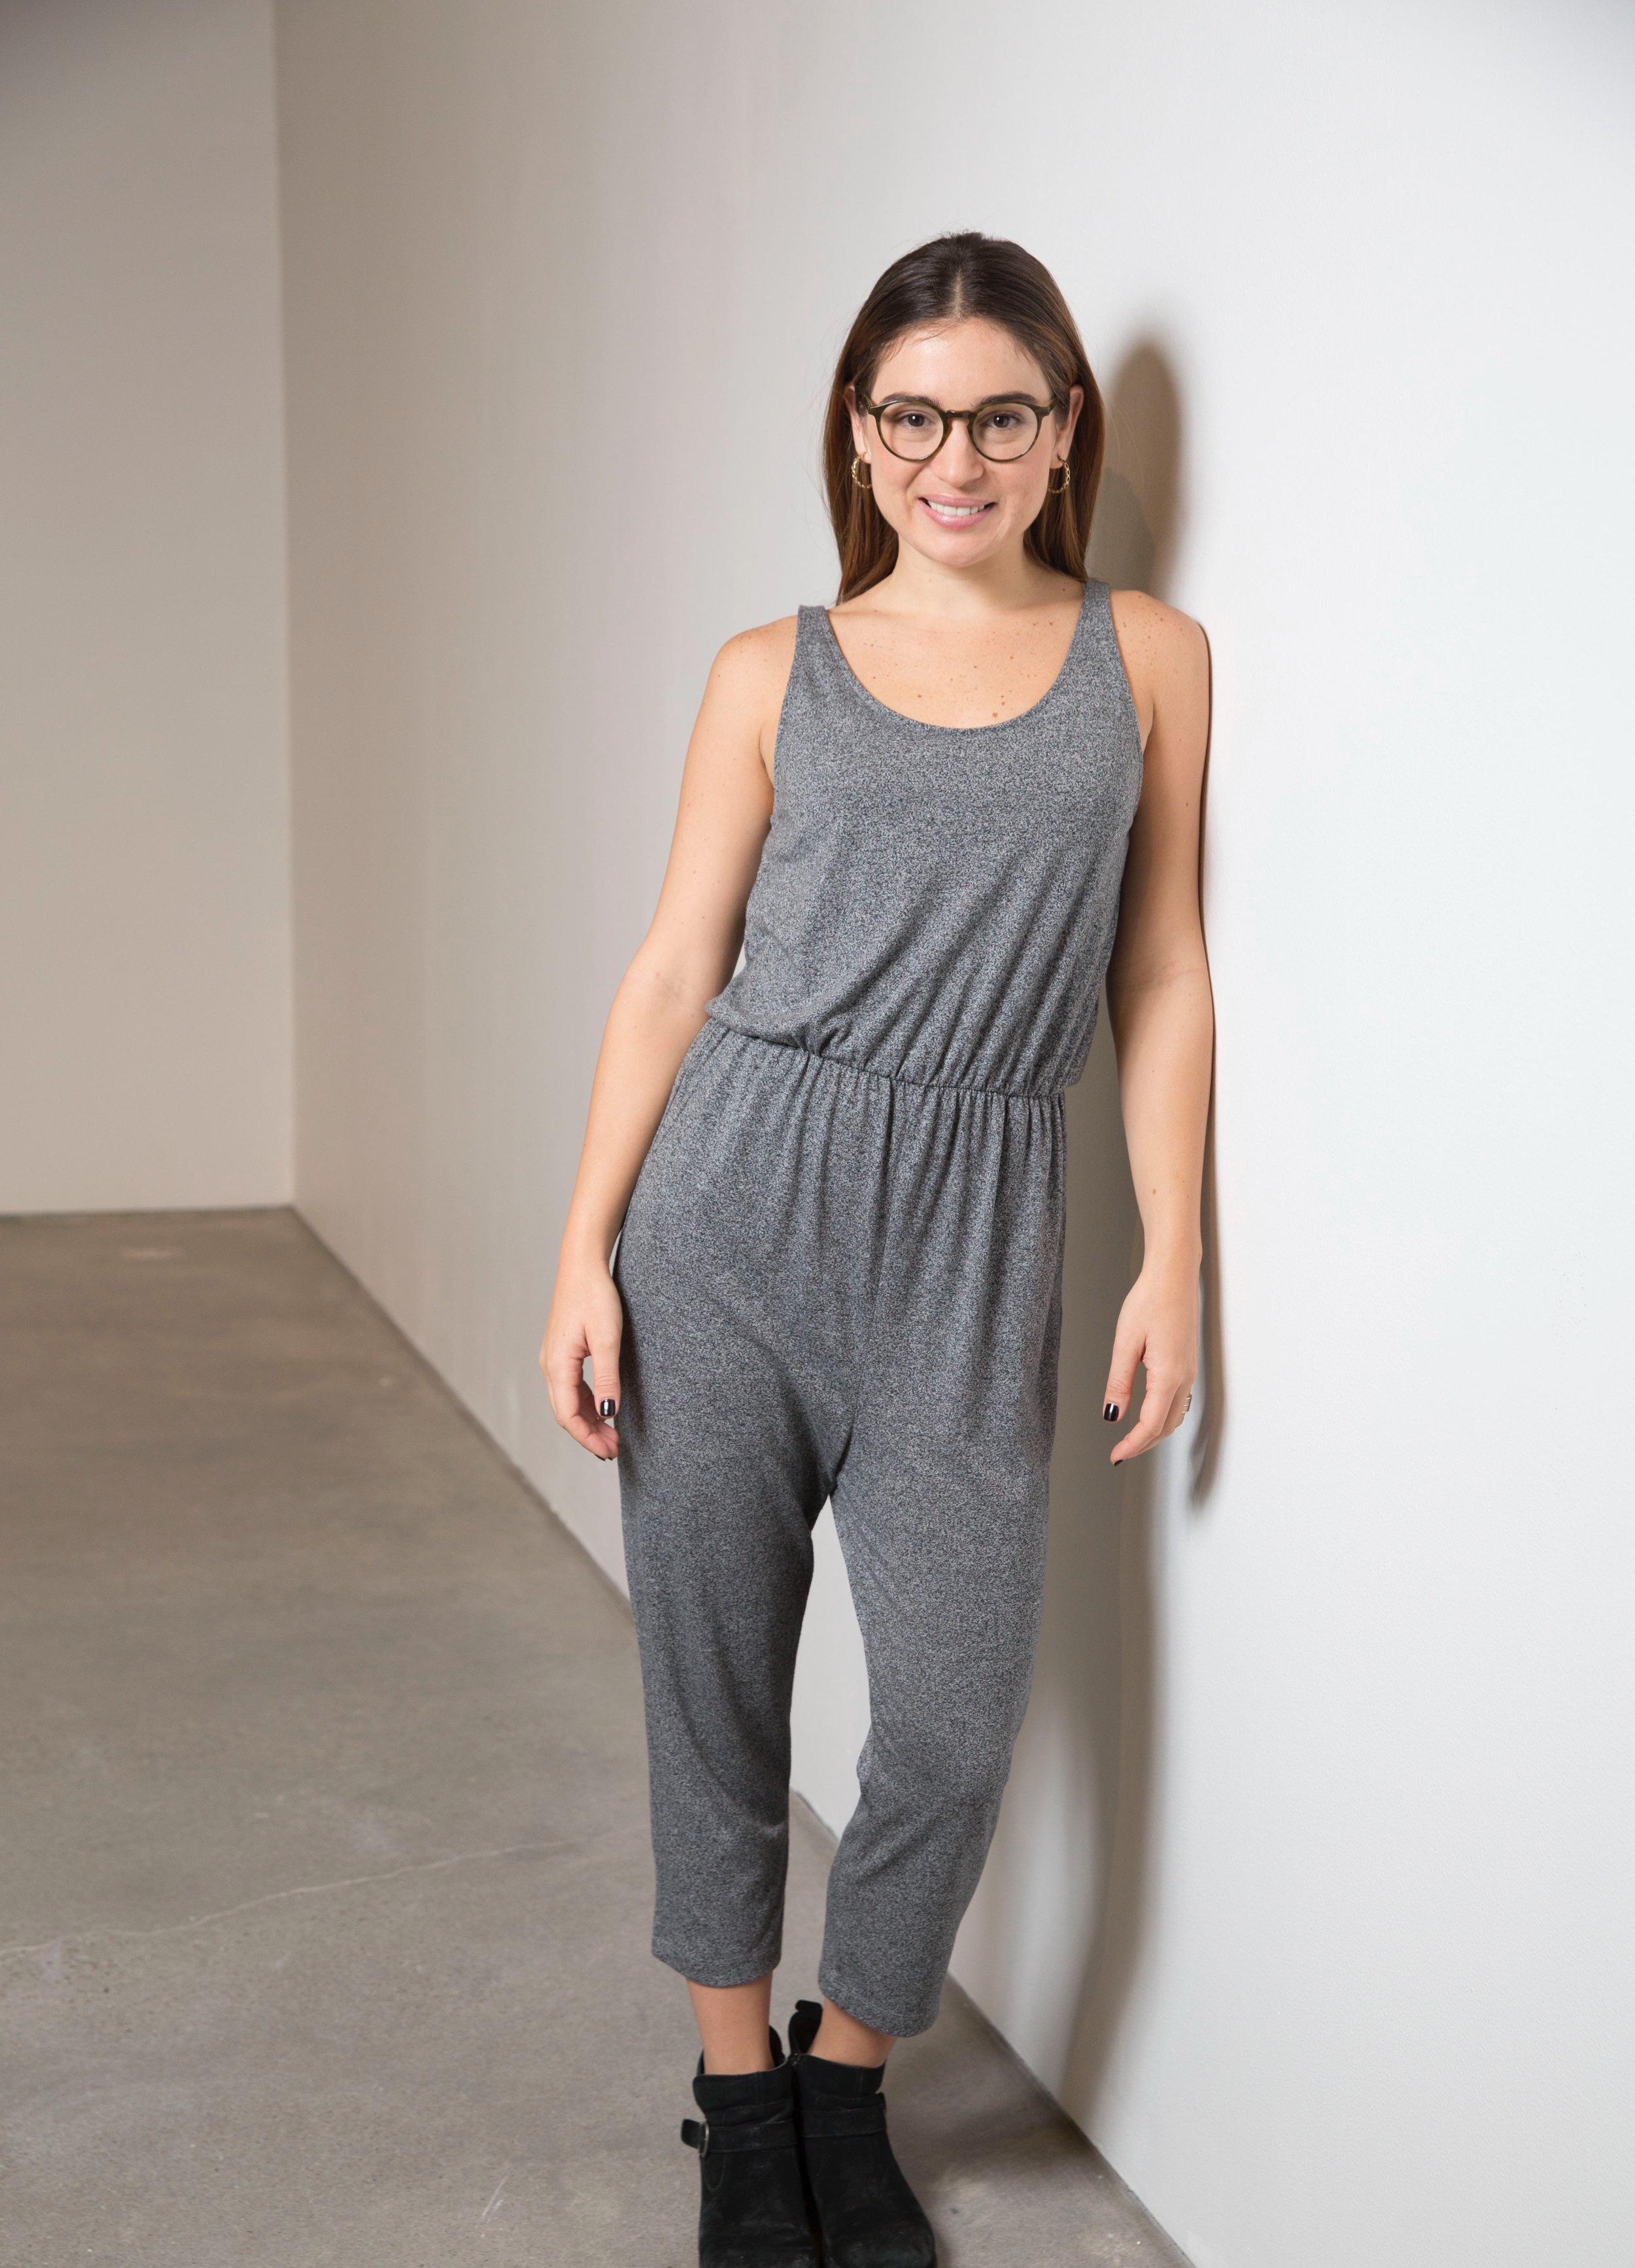 Tatiana Pandiani, Director/Choreographer